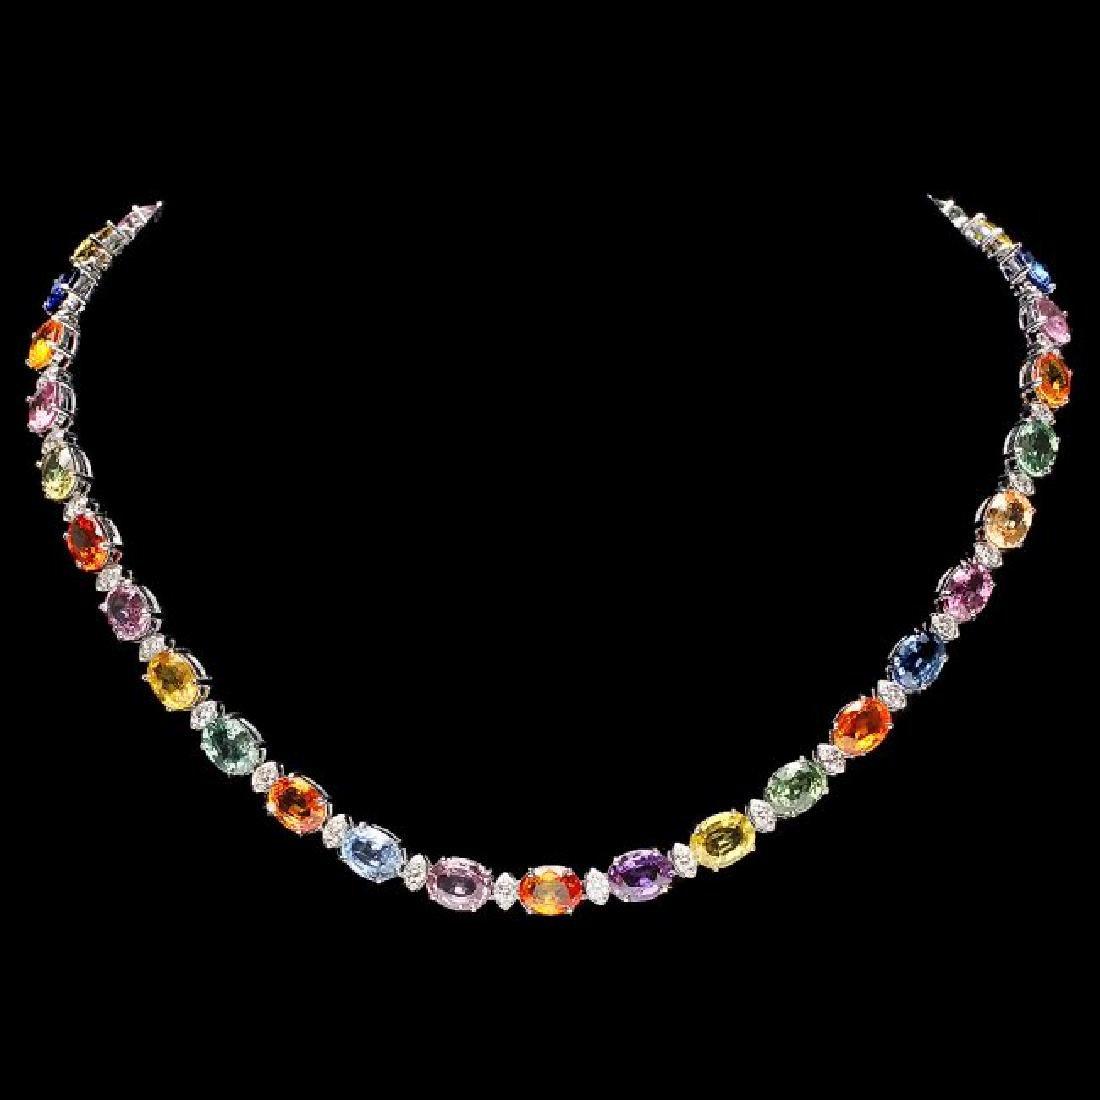 14k Gold 57.00ct Sapphire 2.50ct Diamond Necklace